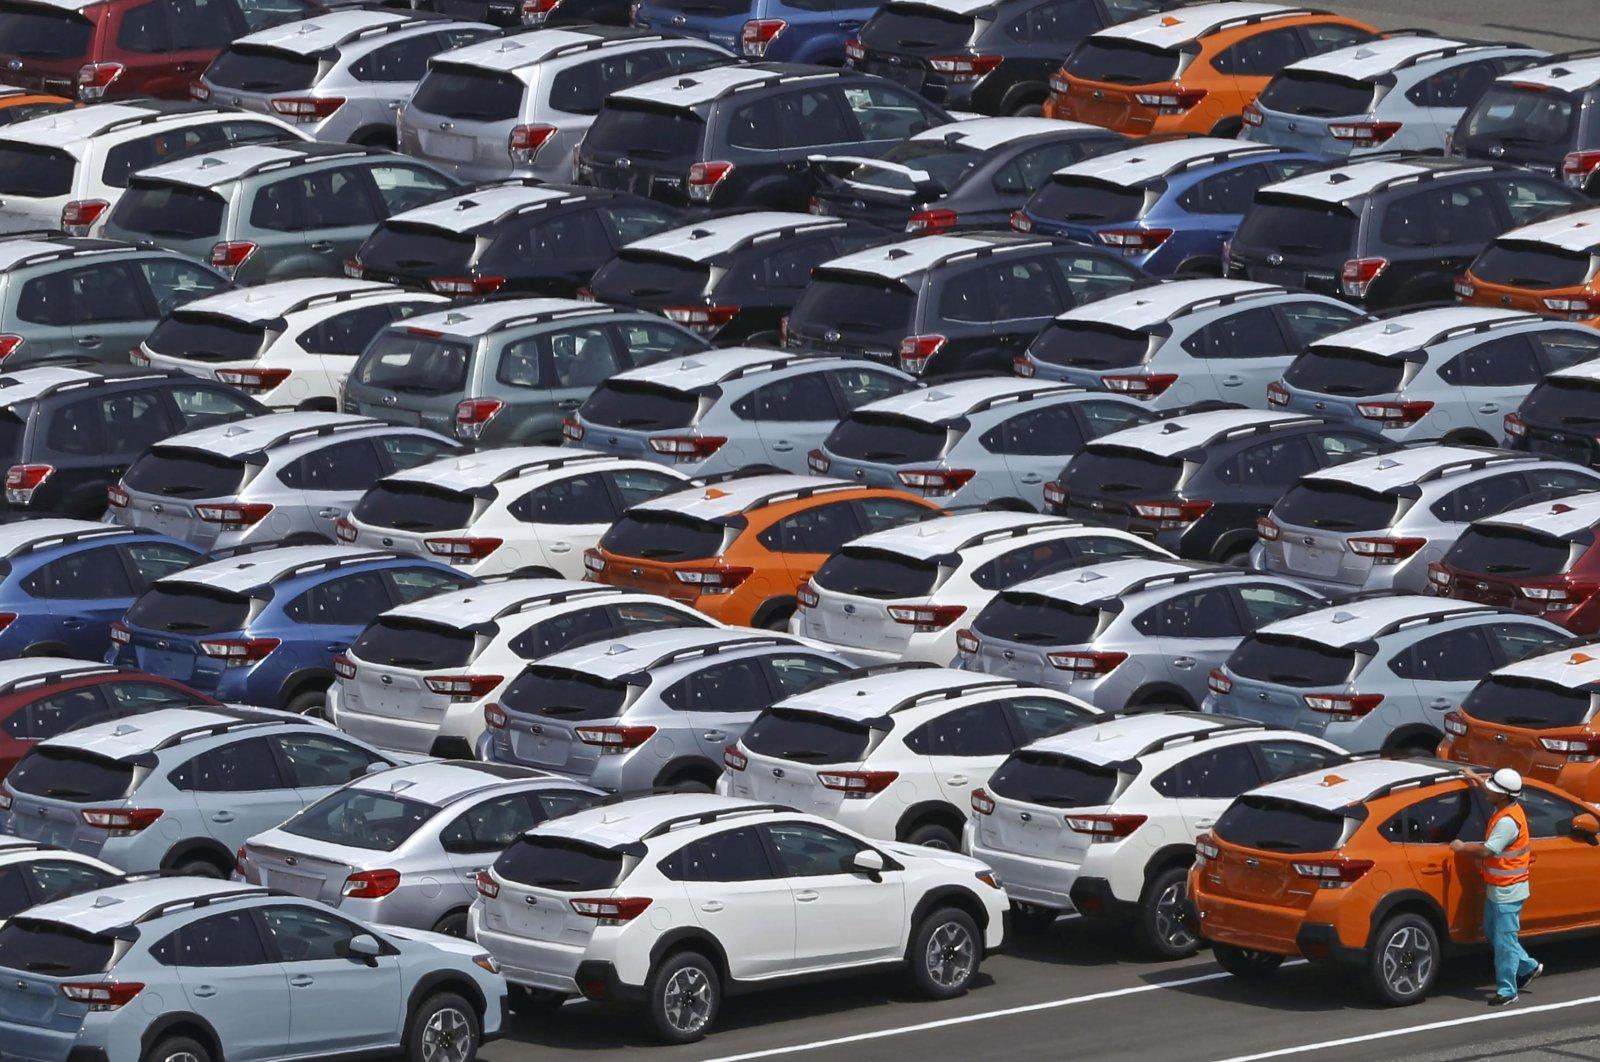 Vehicles wait to be exported at a port in Kawasaki, near Tokyo, Japan, Aug. 2, 2018. (AP Photo)